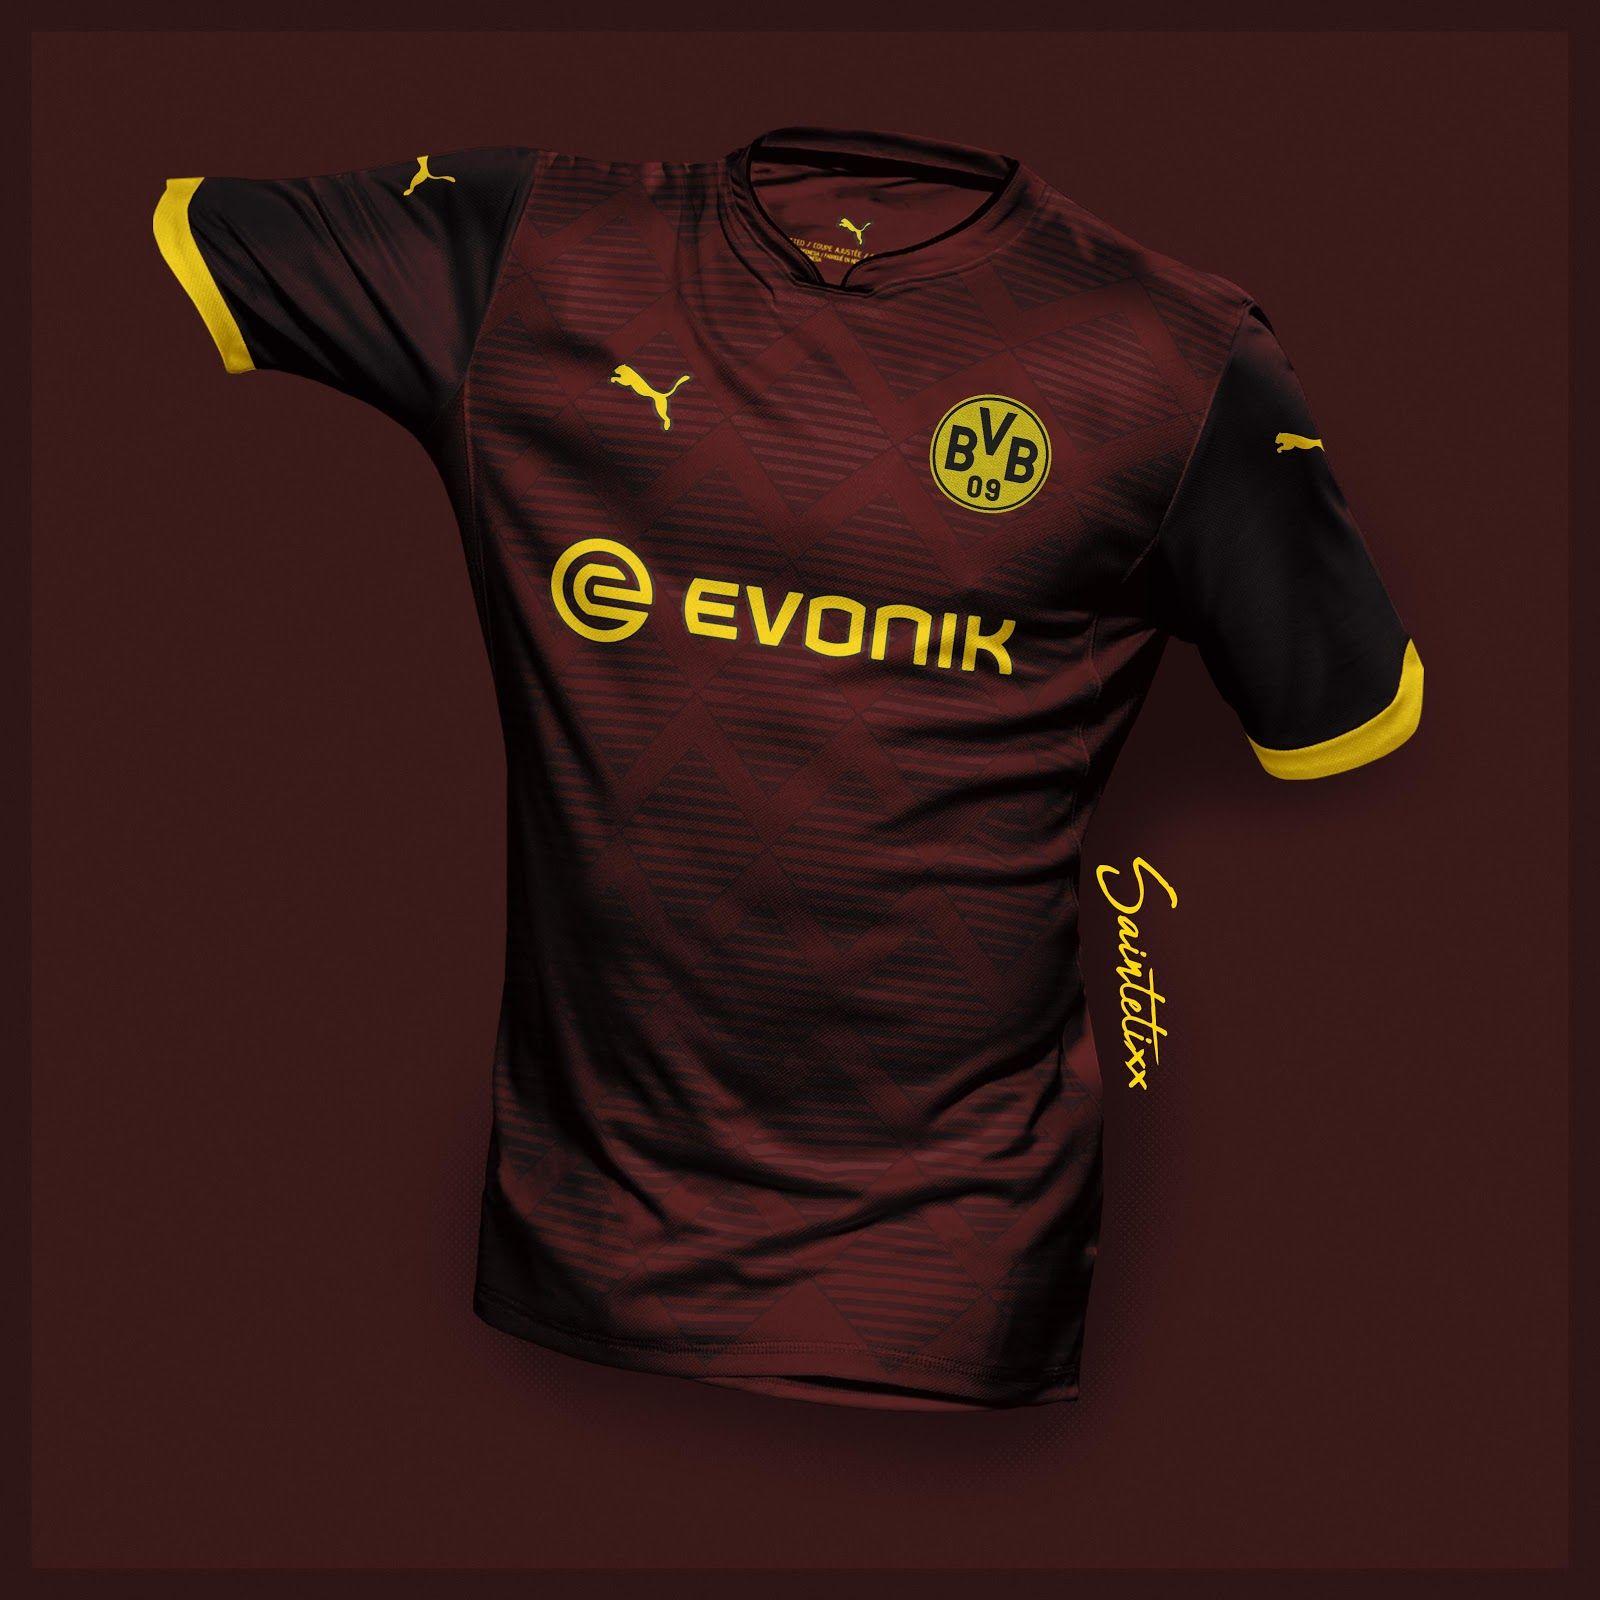 Incredible Puma Borussia Dortmund 19 20 Home Away Third Concept Kits By Saintetixx Footy Headlines In 2020 Sport Shirt Design Sports Jersey Design Jersey Design